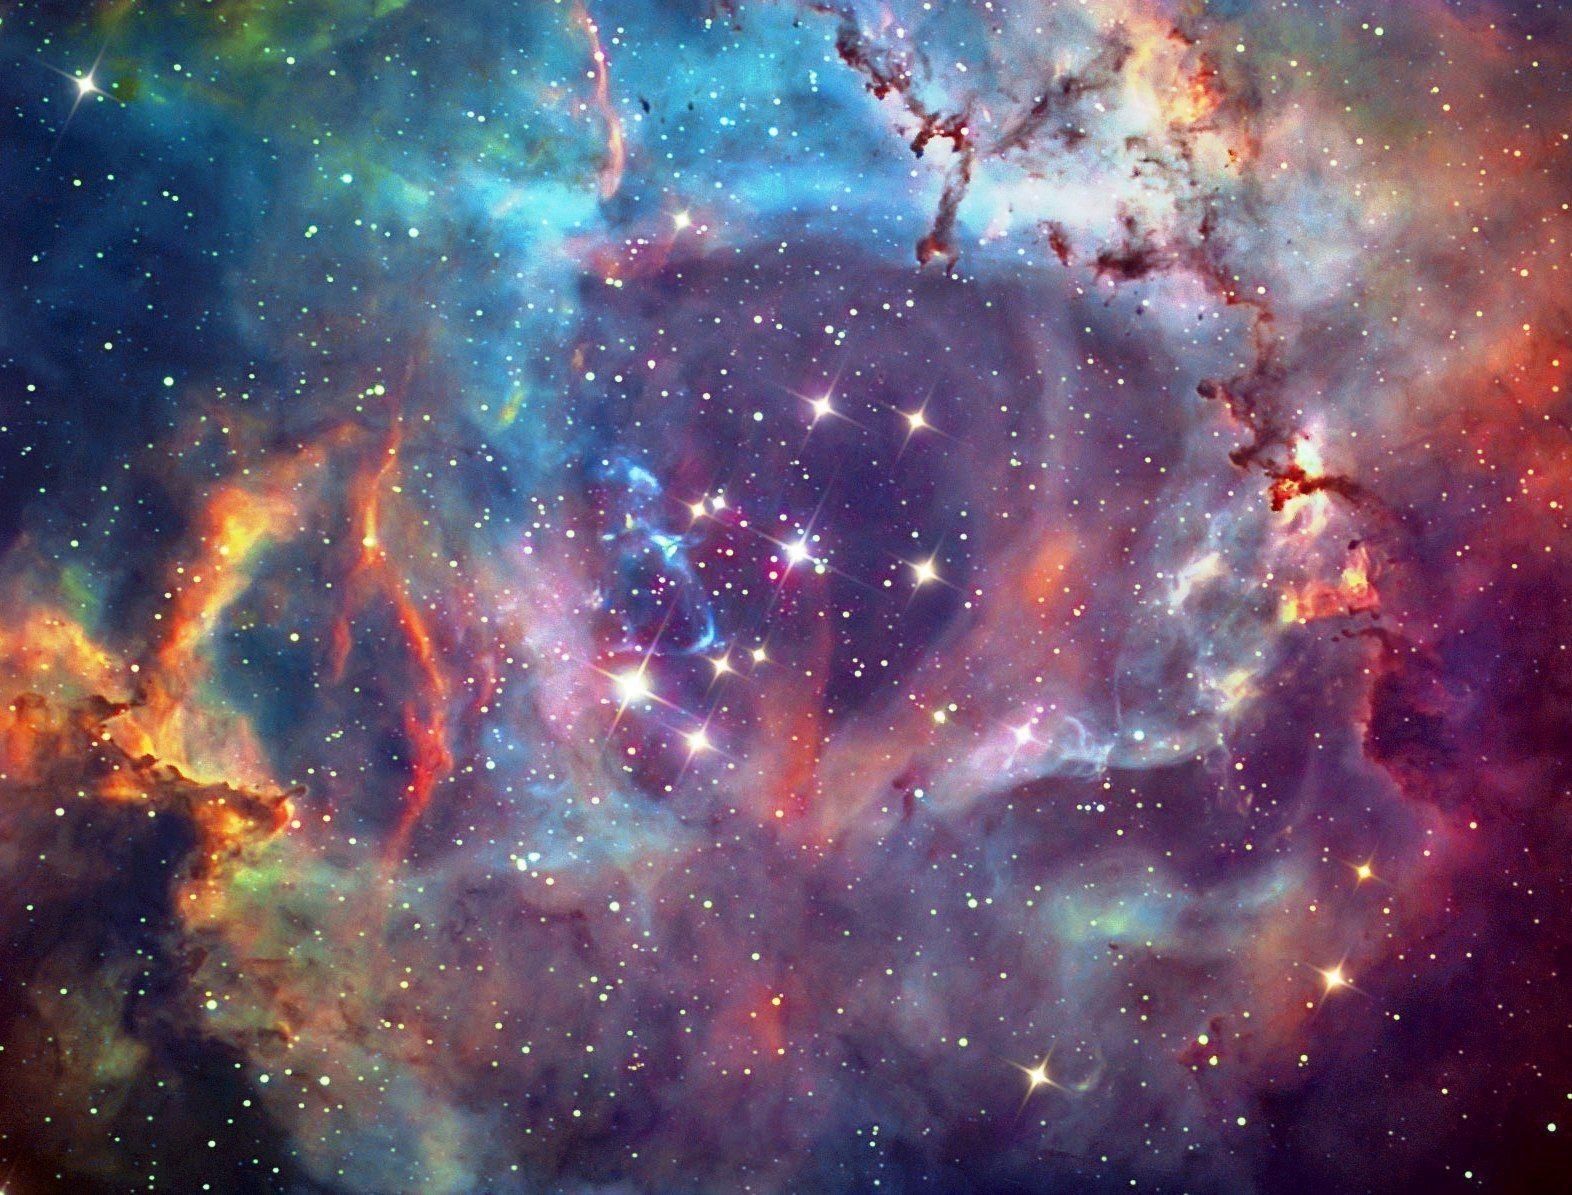 Galaxy Desktop Backgrounds